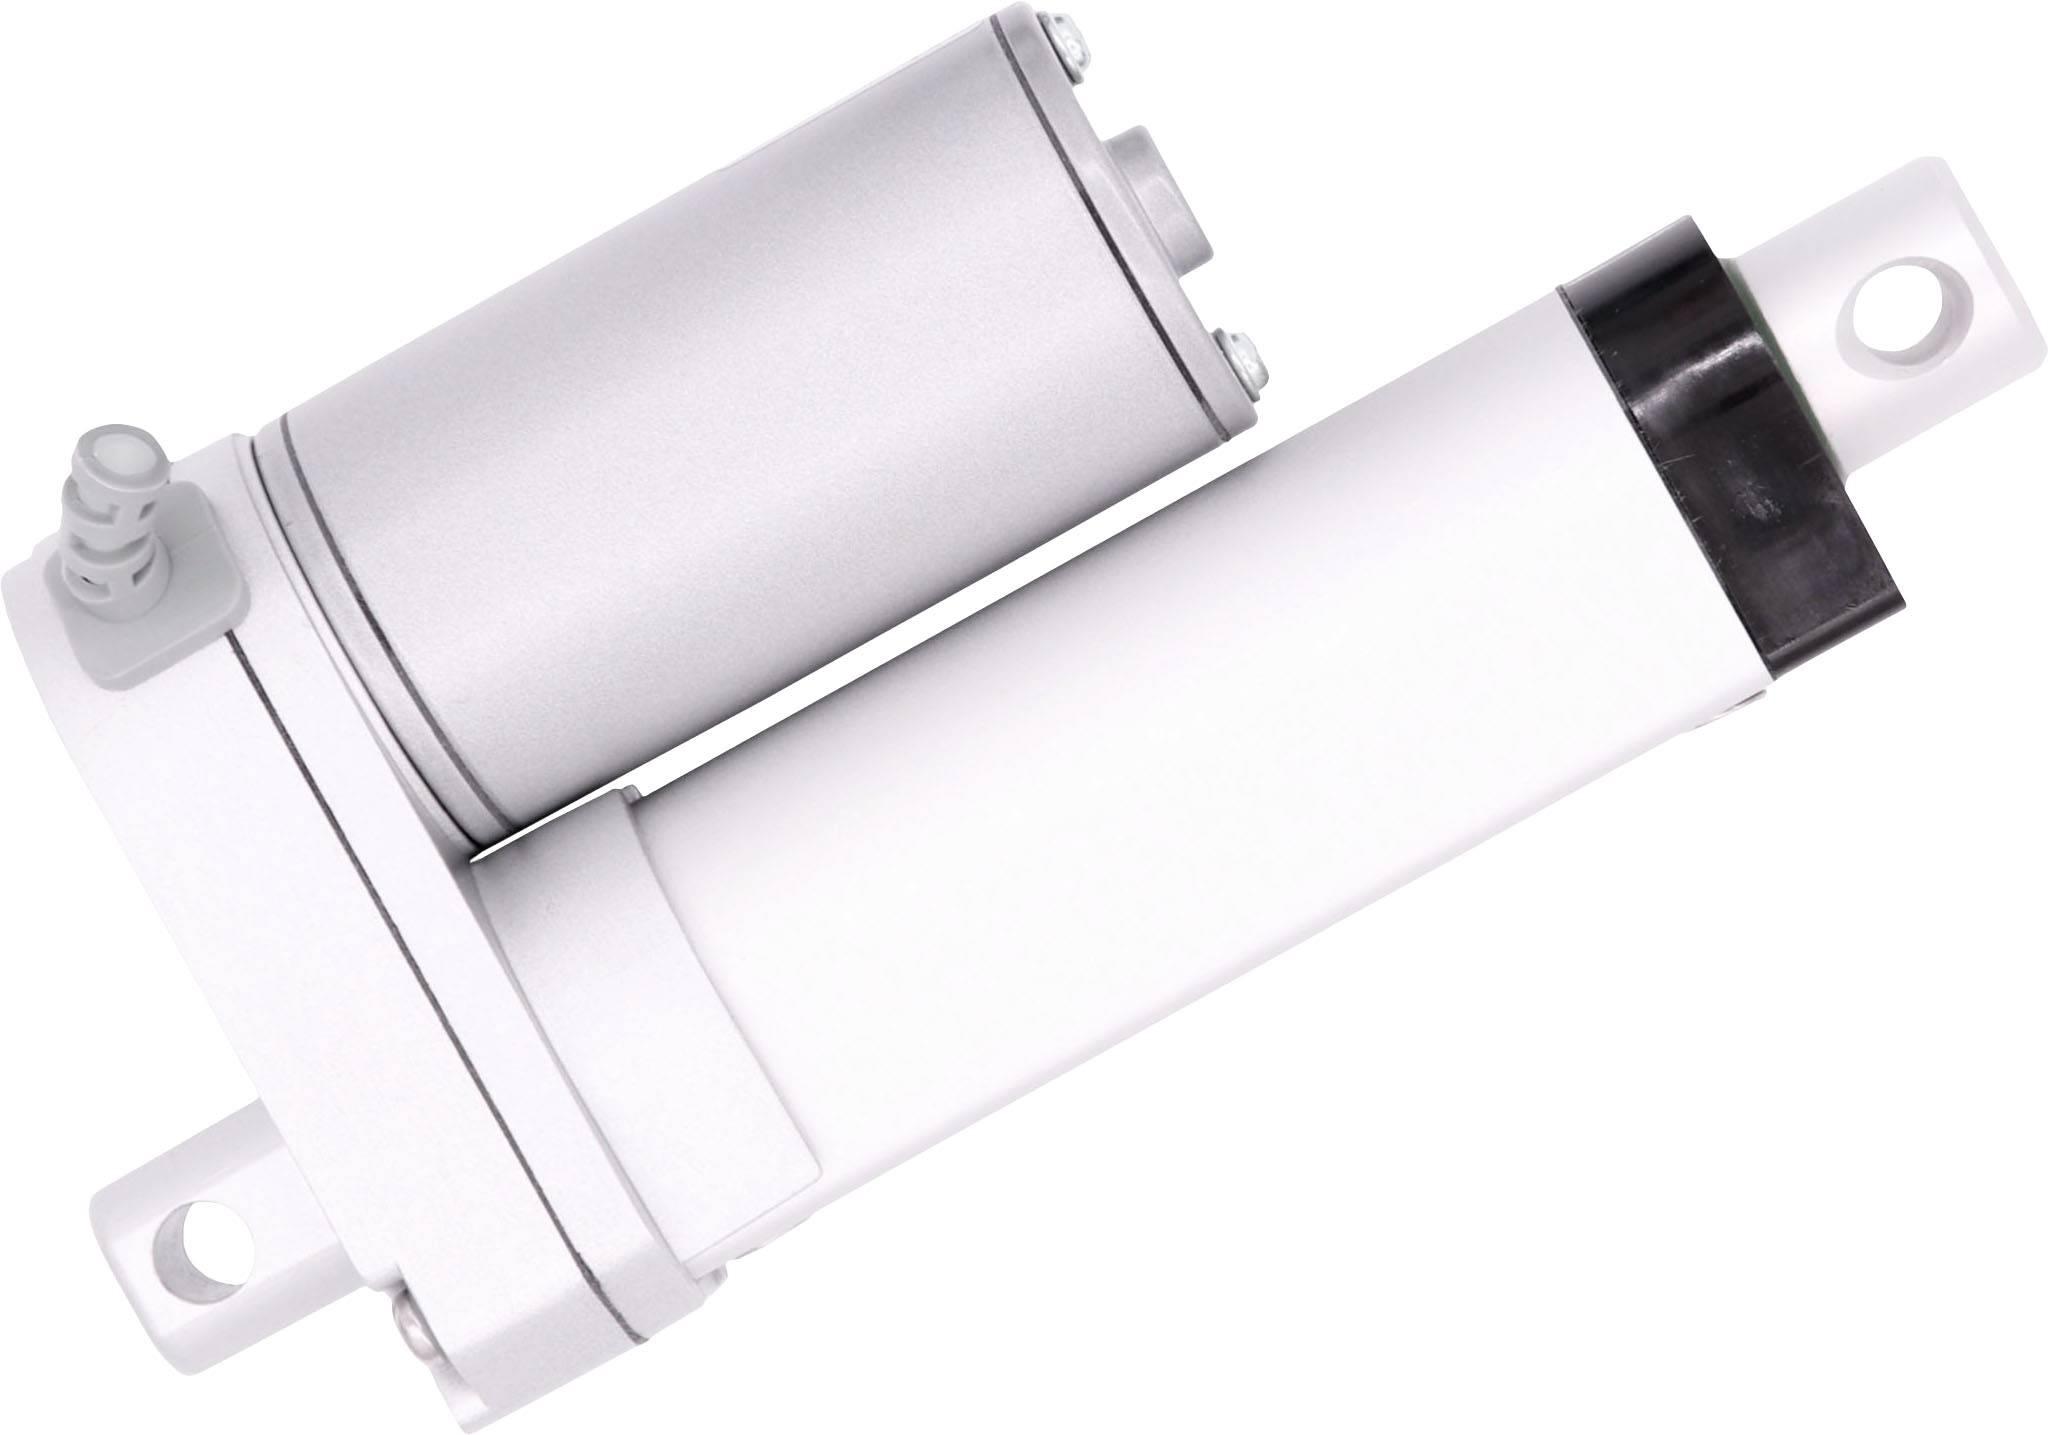 Lineární servomotor Drive-System Europe DSZY1-24-10-A-025-IP65, 250 N, 24 V/DC, délka 25 mm